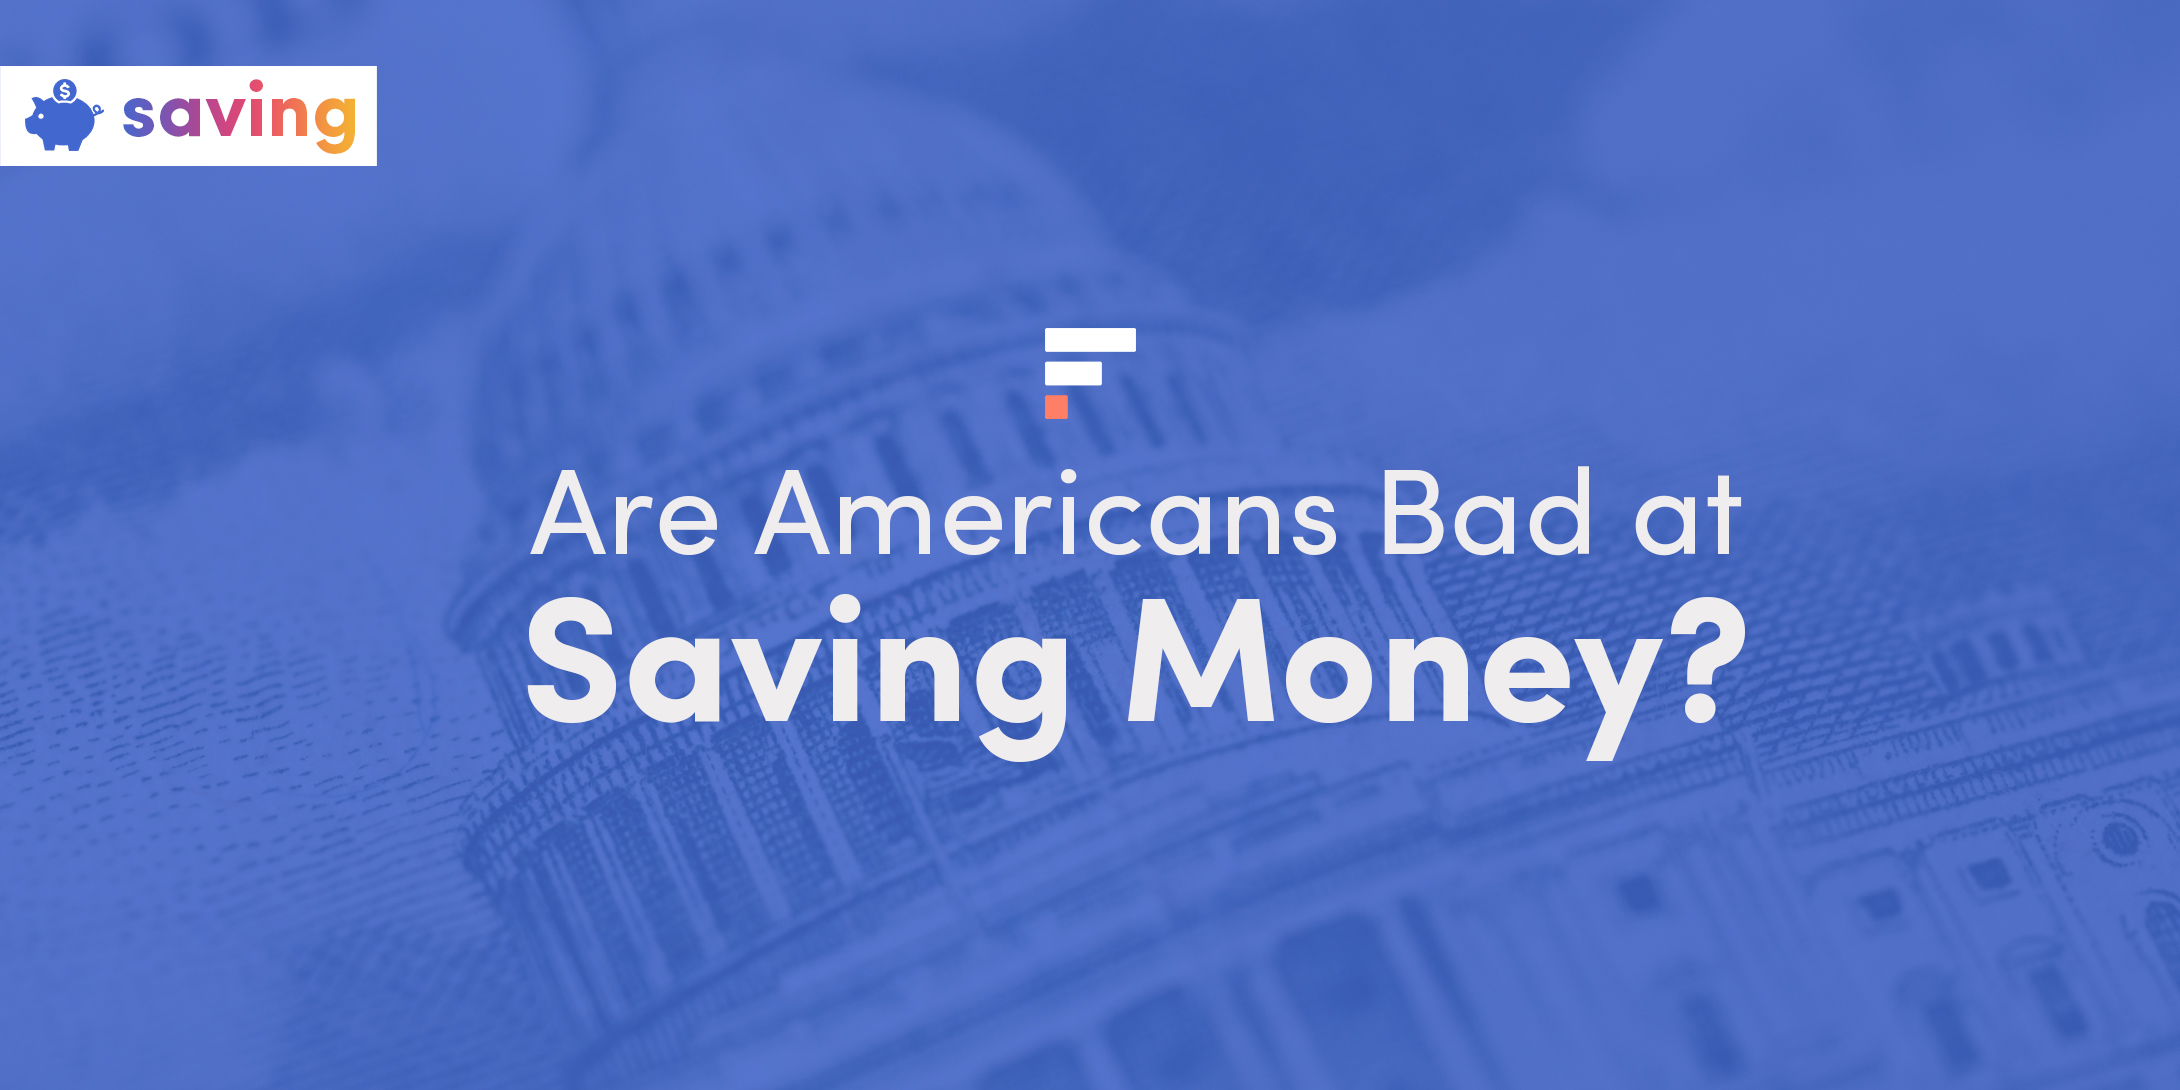 Are Americans Bad at Saving Money?